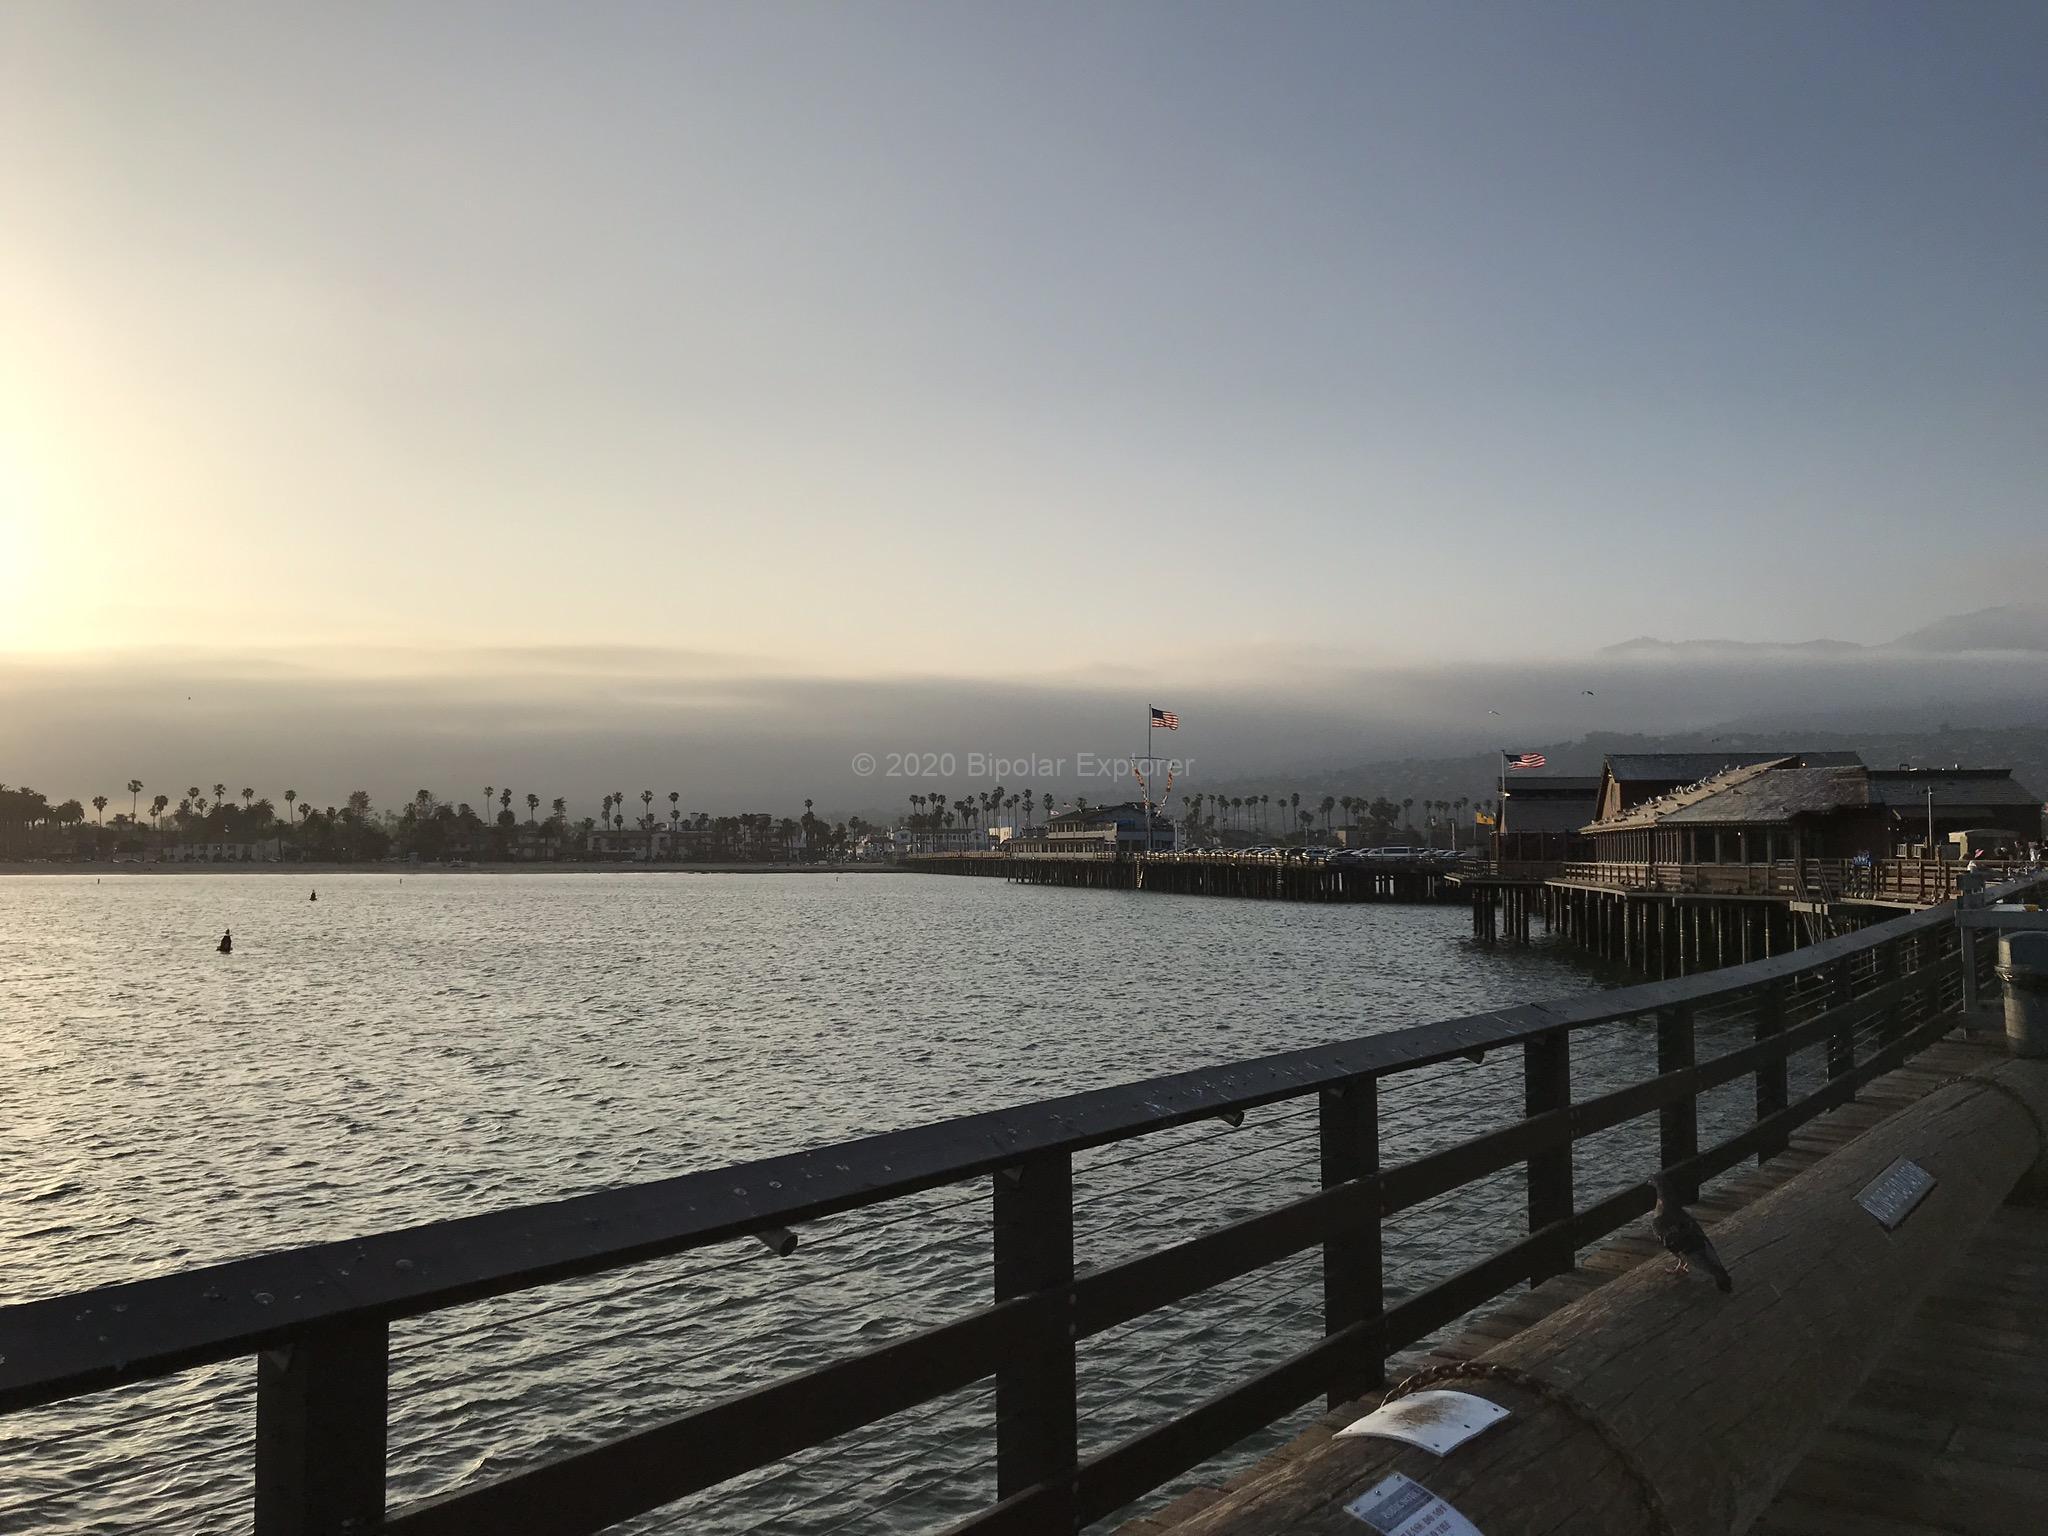 Day 3 Santa Barbara Pier